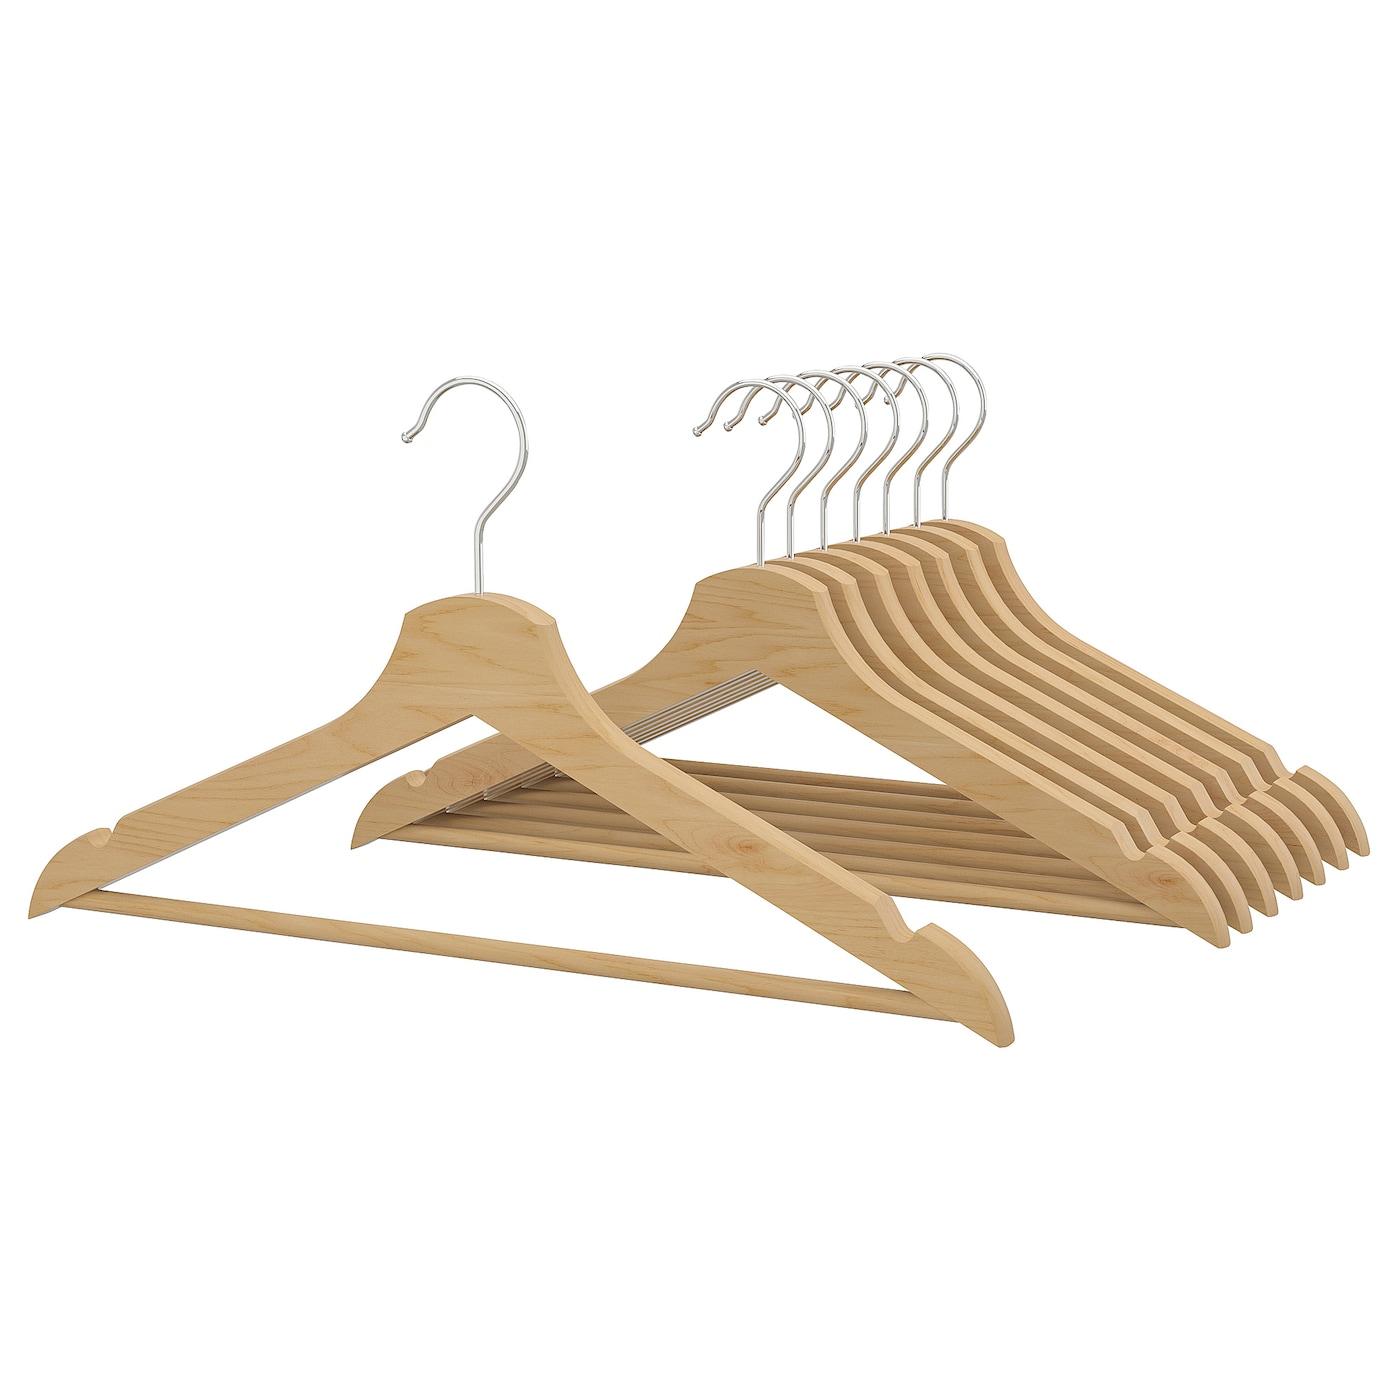 IKEA BUMERANG 8 Stück weiß Kleiderbügel Holzbügel Garderobenbügel Hosenbügel Neu